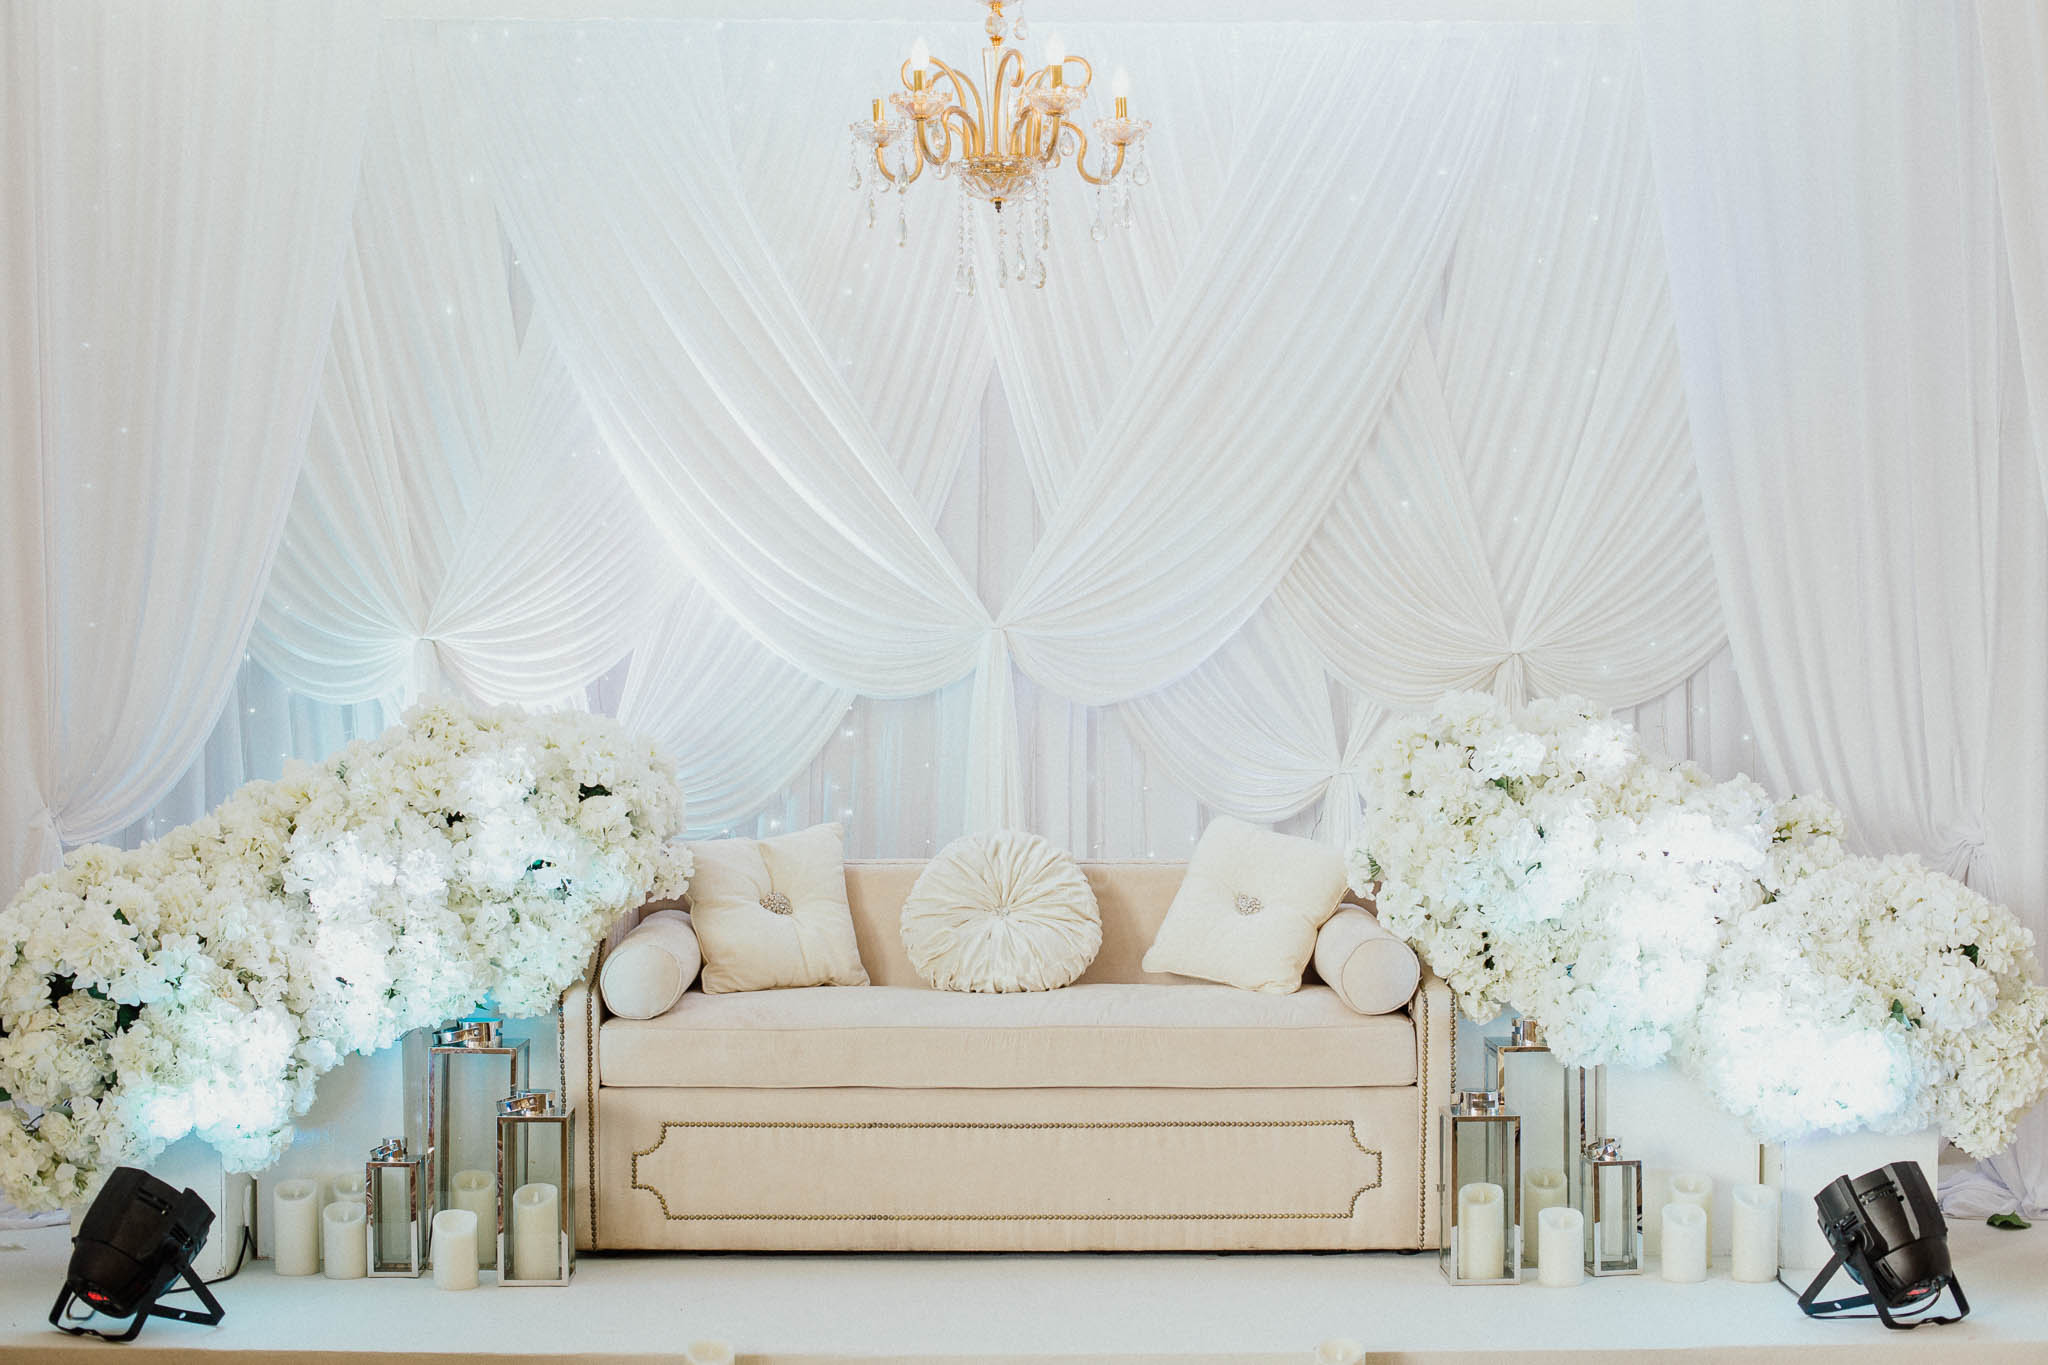 singapore-wedding-photographer-addafiq-nufail-007.jpg